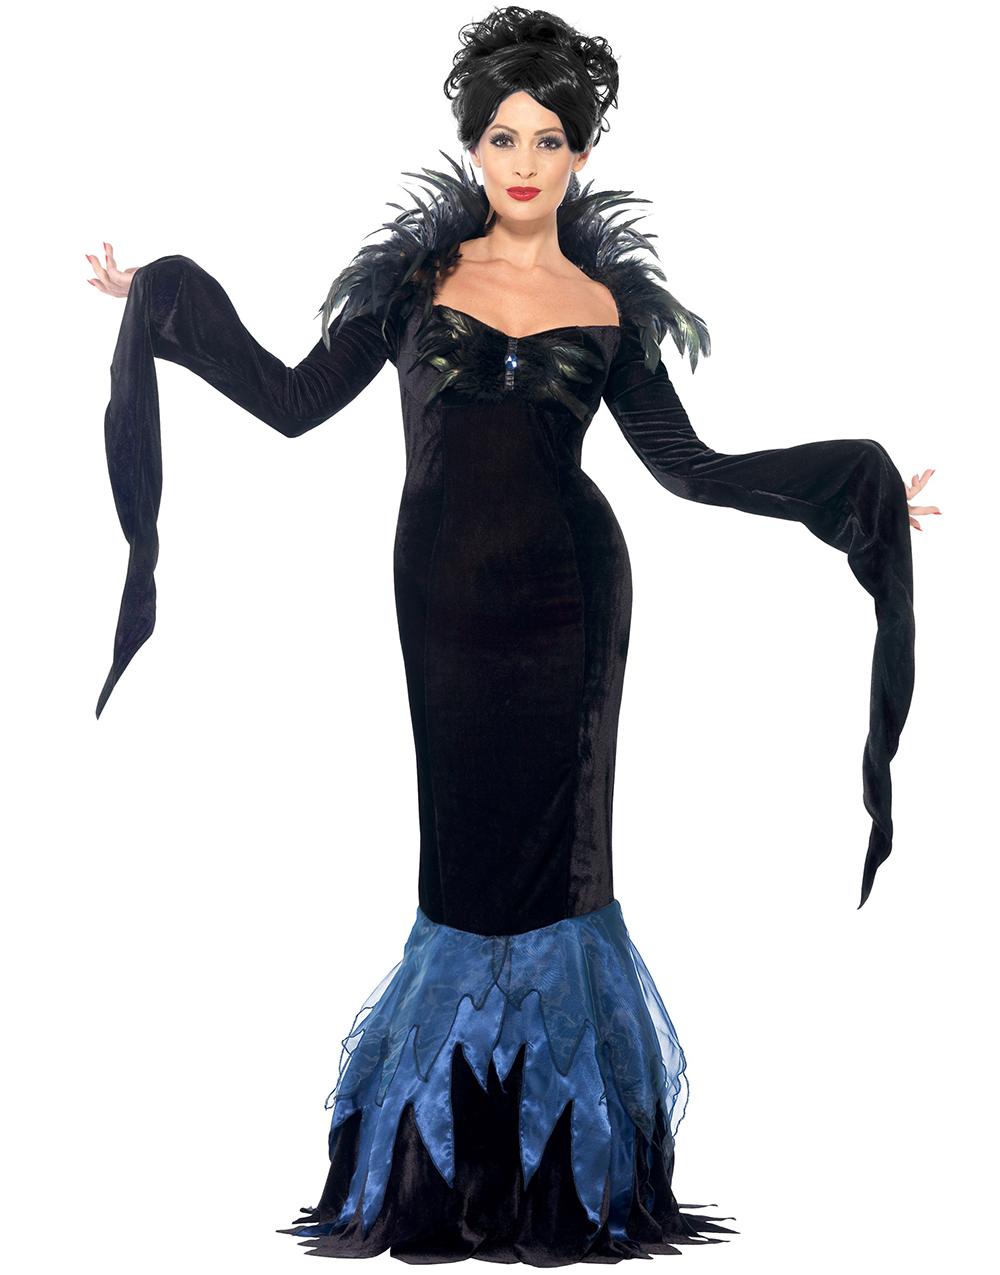 Carmen Electra anal kjønn